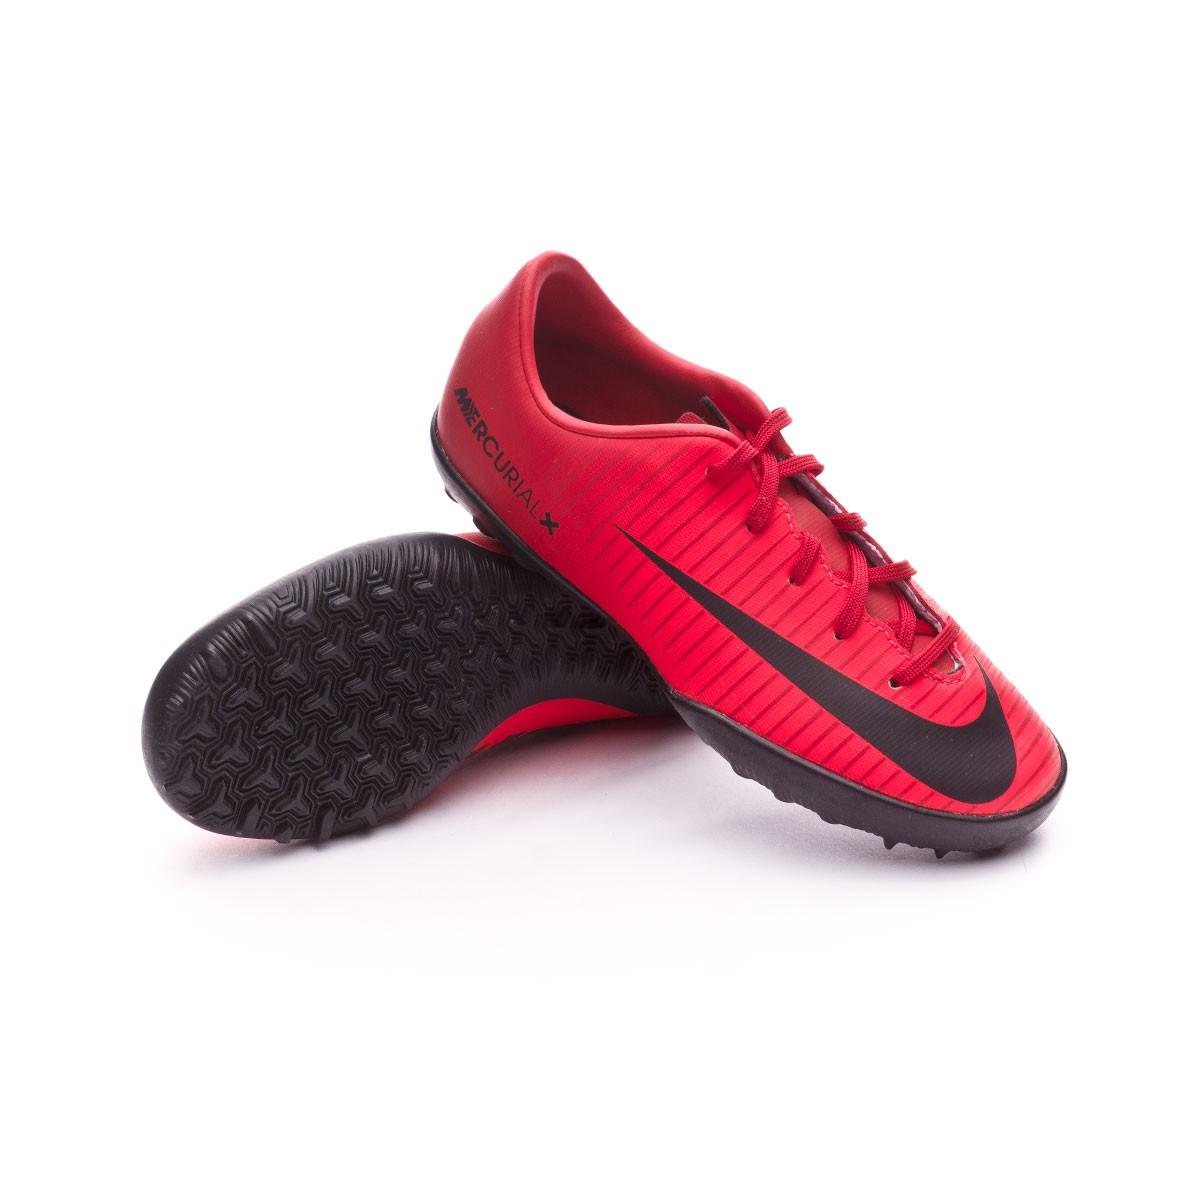 dfd6d1ed1c44 Football Boot Nike MercurialX Vapor XI Turf Niño University red ...